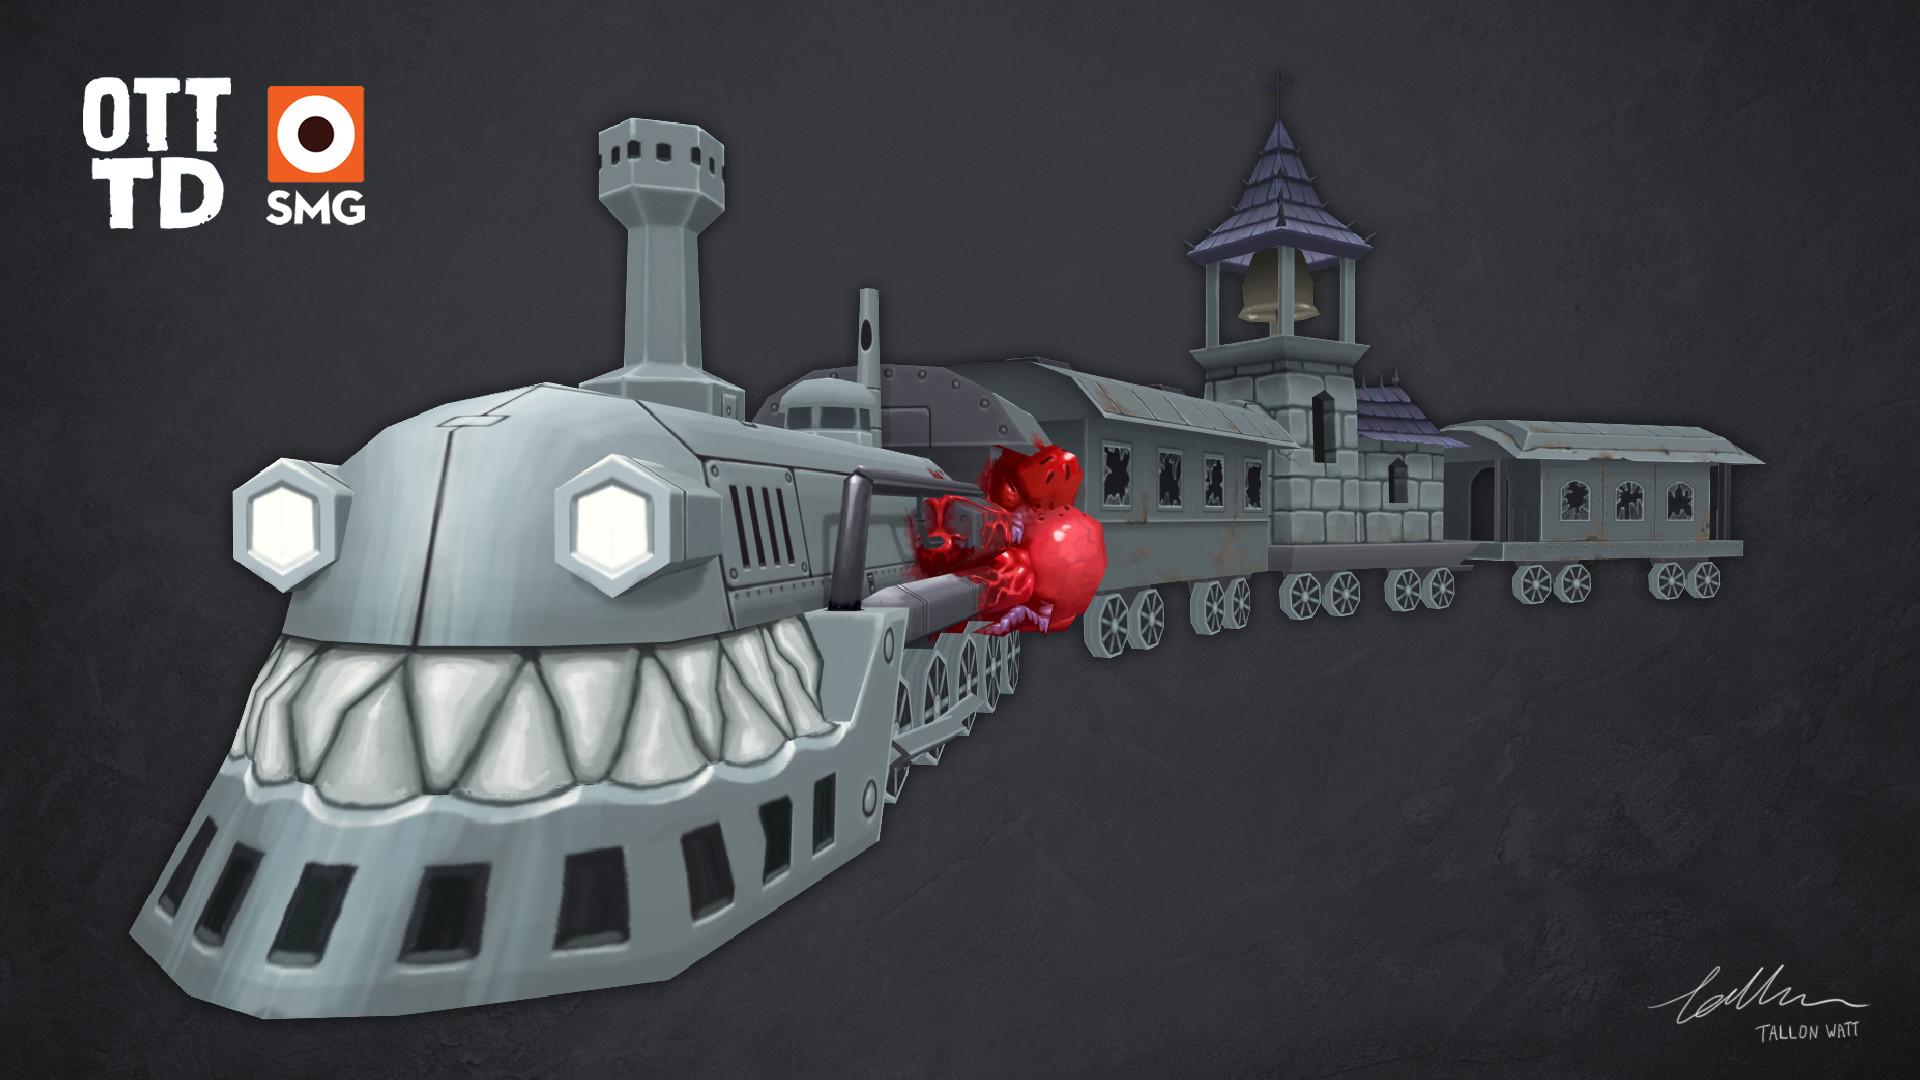 Tallon watt ghost train